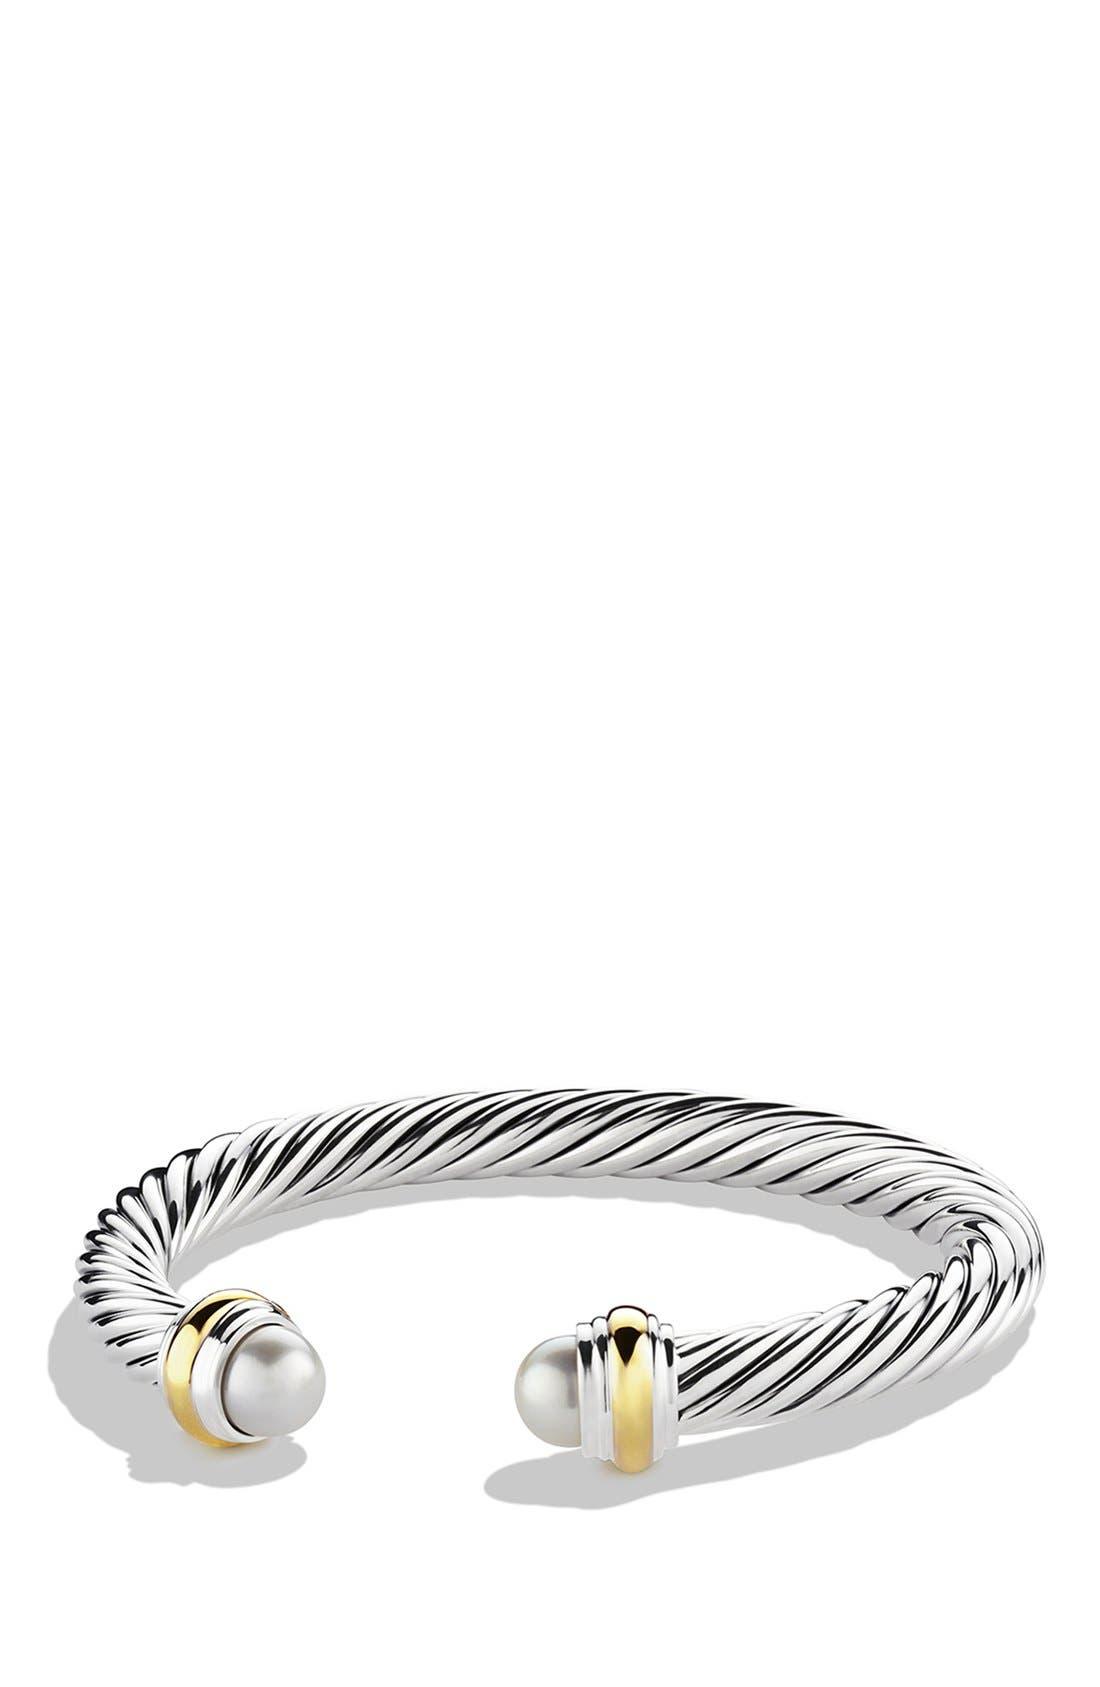 Main Image - David Yurman Cable Classics Bracelet with Semiprecious Stones